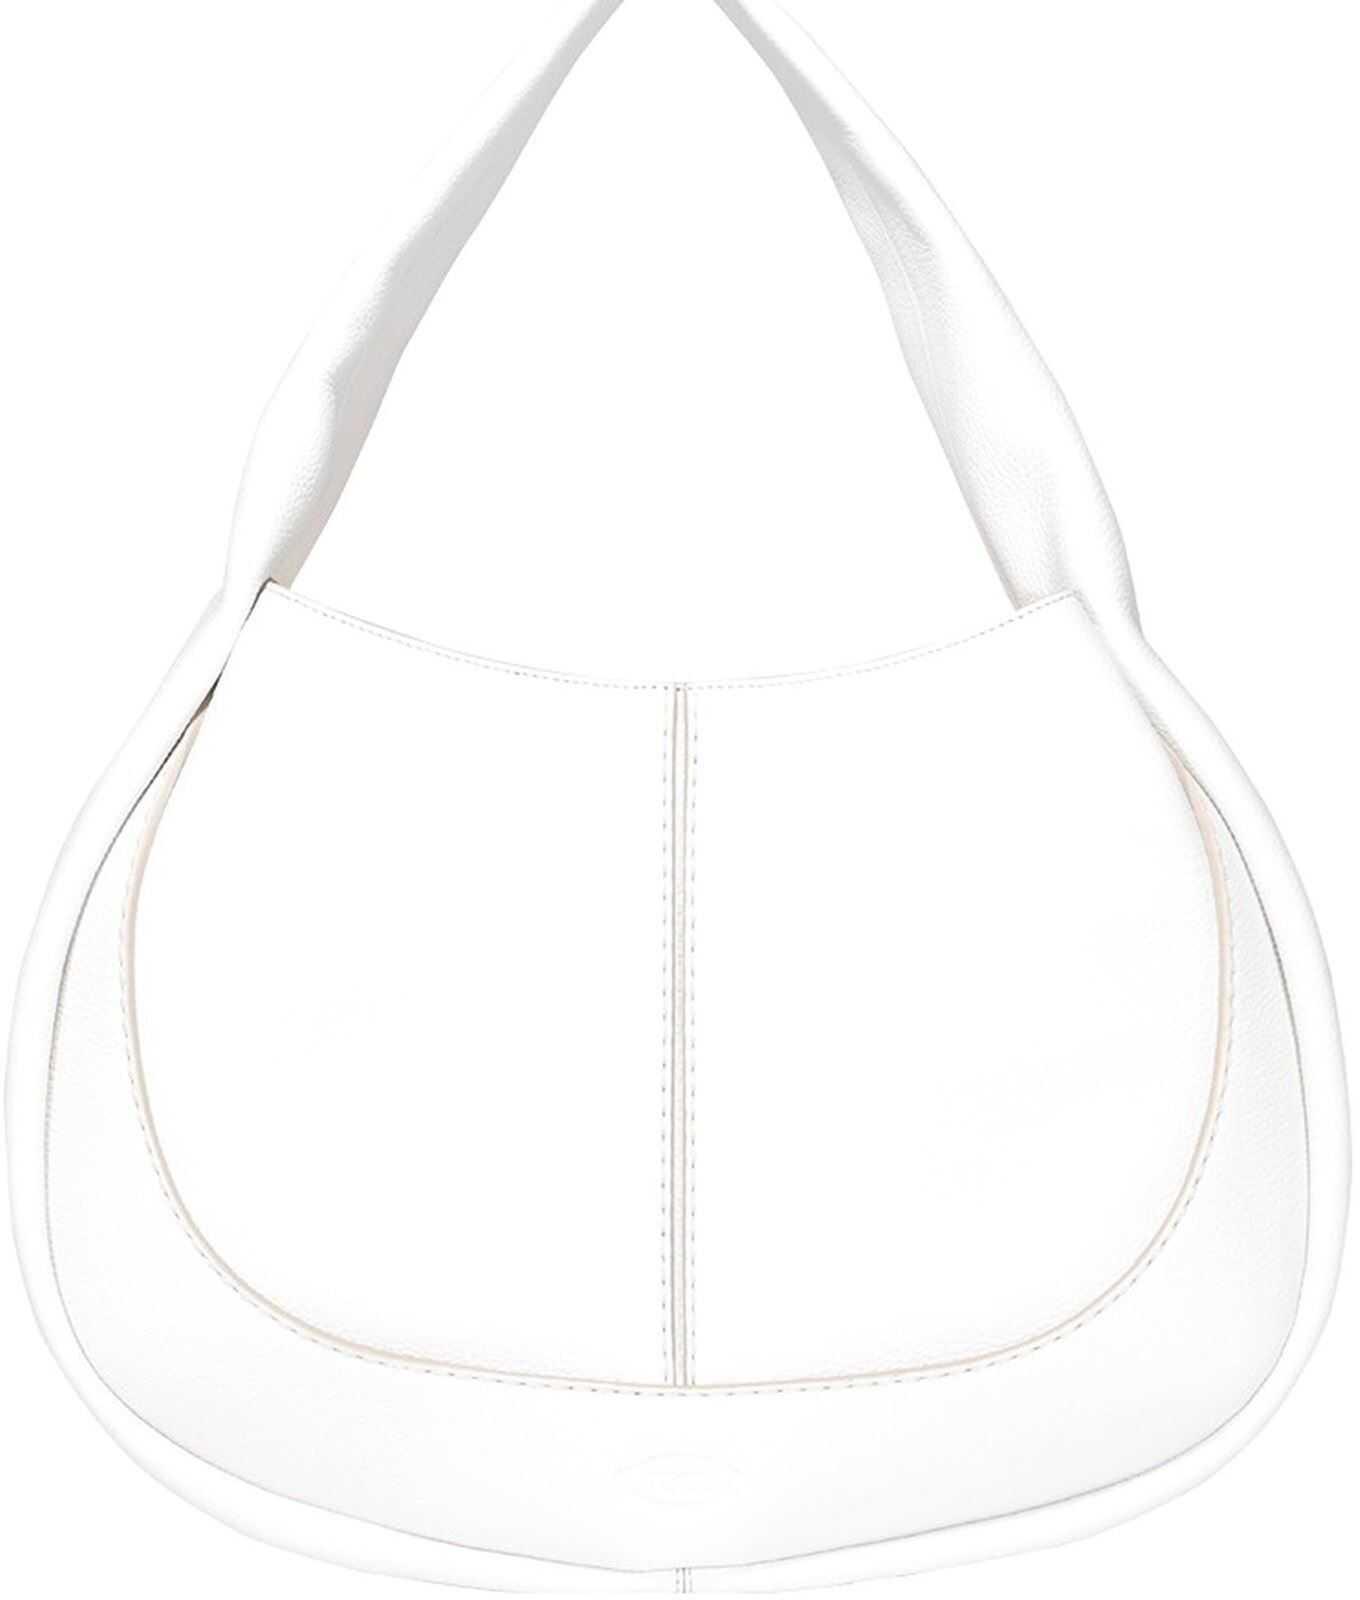 TOD'S Leather Medium Hobo Bag In White XBWAOUS0300UCAB015 White imagine b-mall.ro